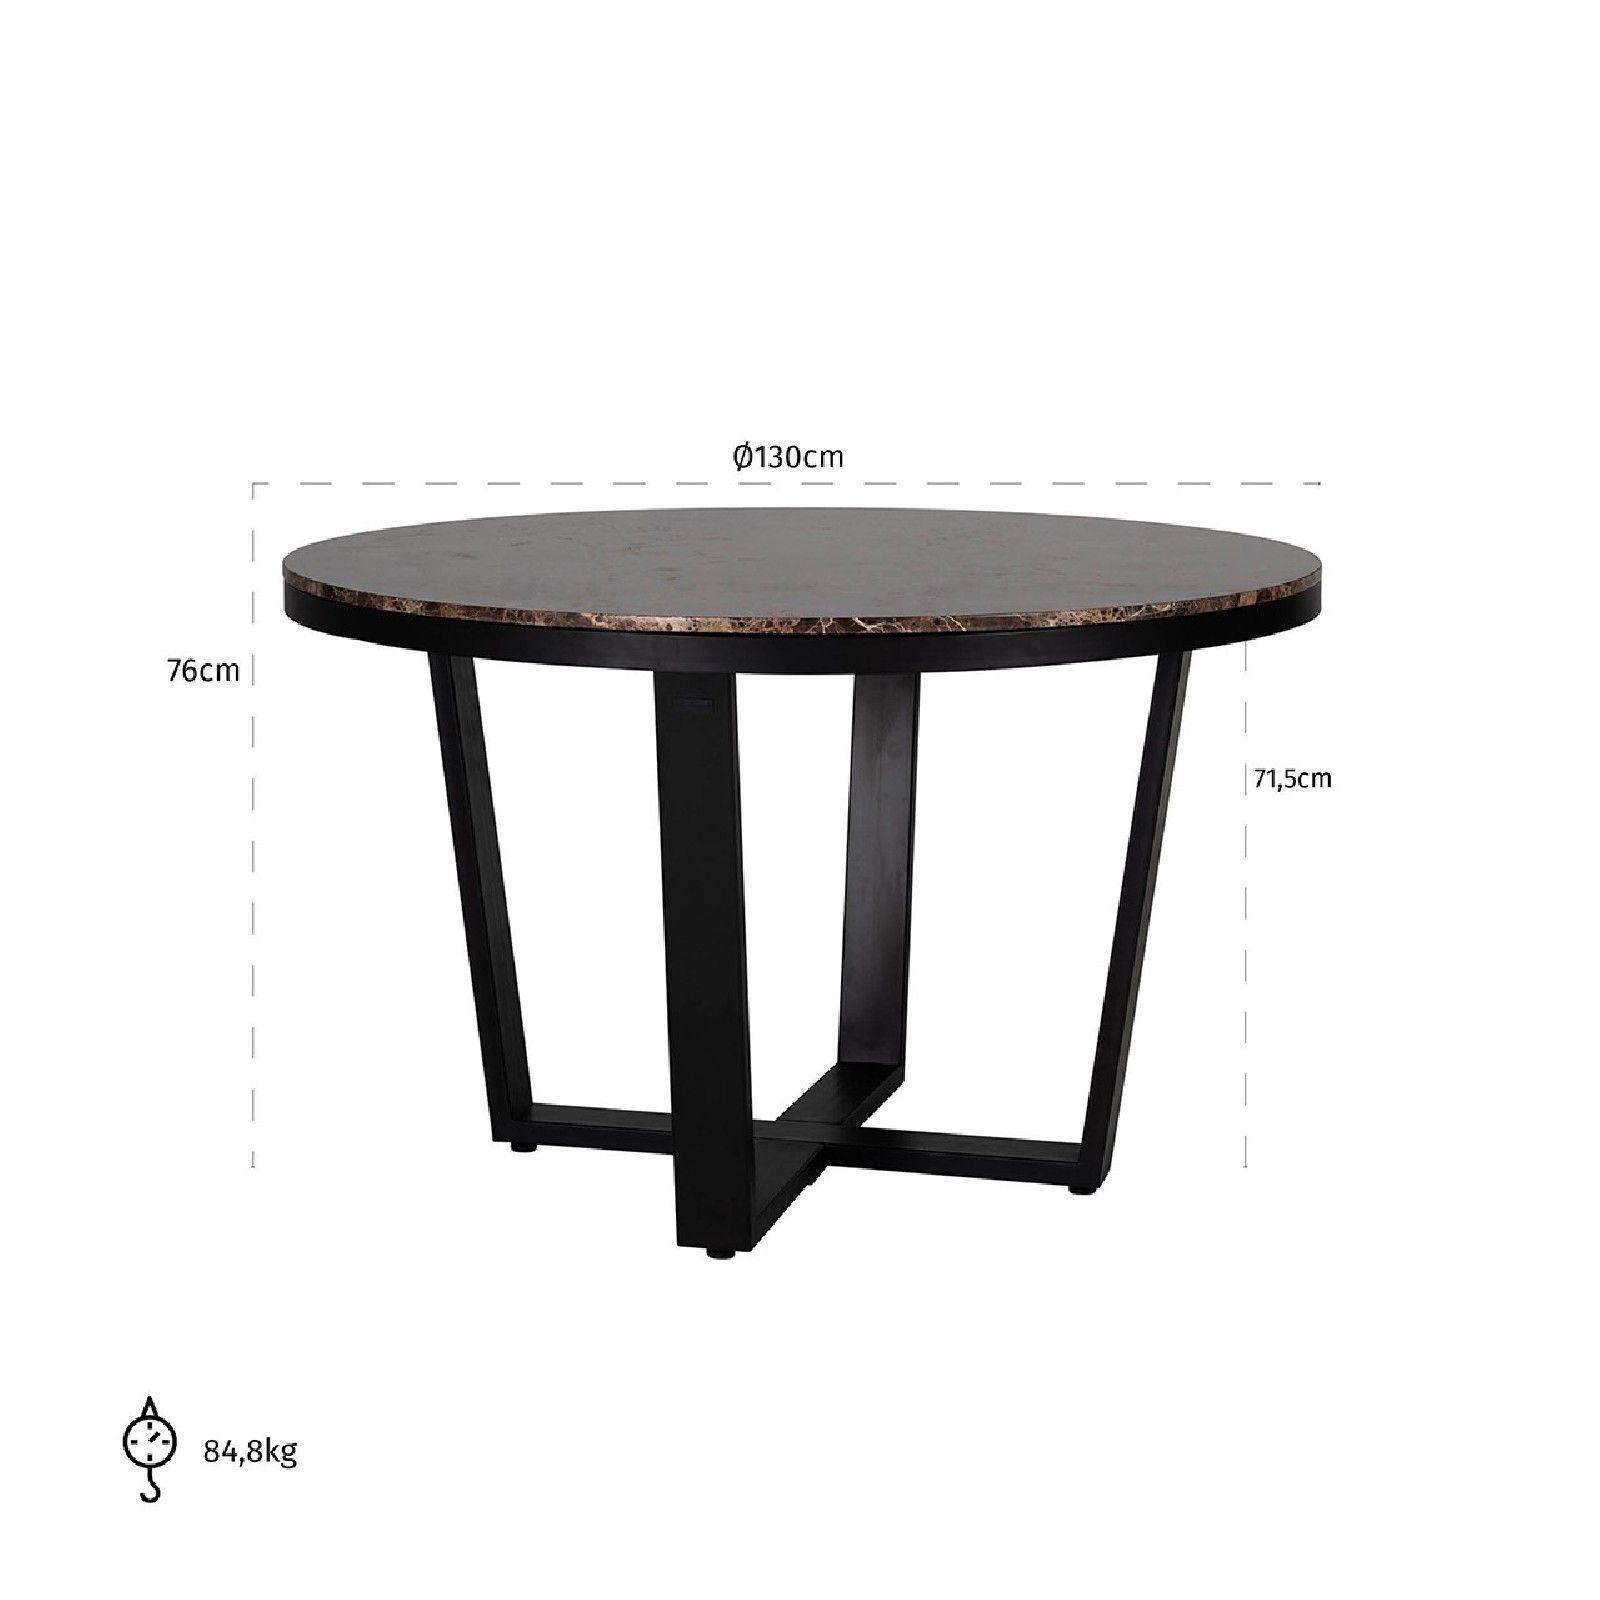 Table à dîner Dalton brown emperador rond 130Ø Meuble Déco Tendance - 854